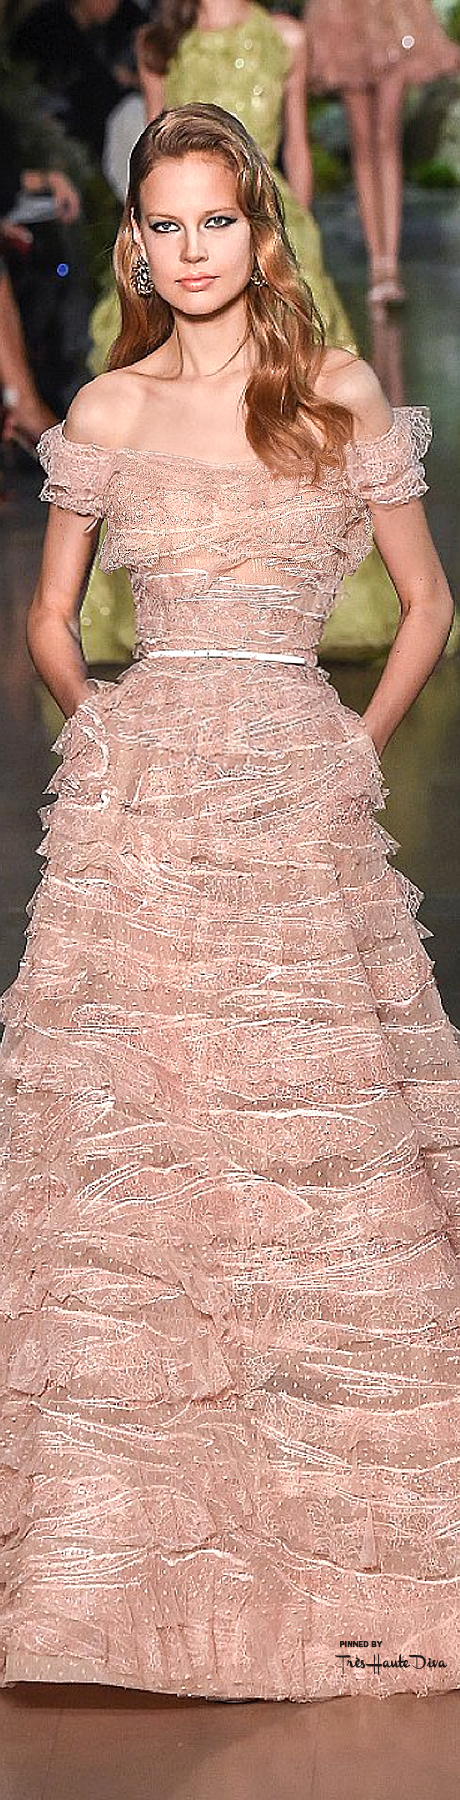 Elie Saab Spring 2015 Couture ♔THD♔ | DE FIESTA | Pinterest ...